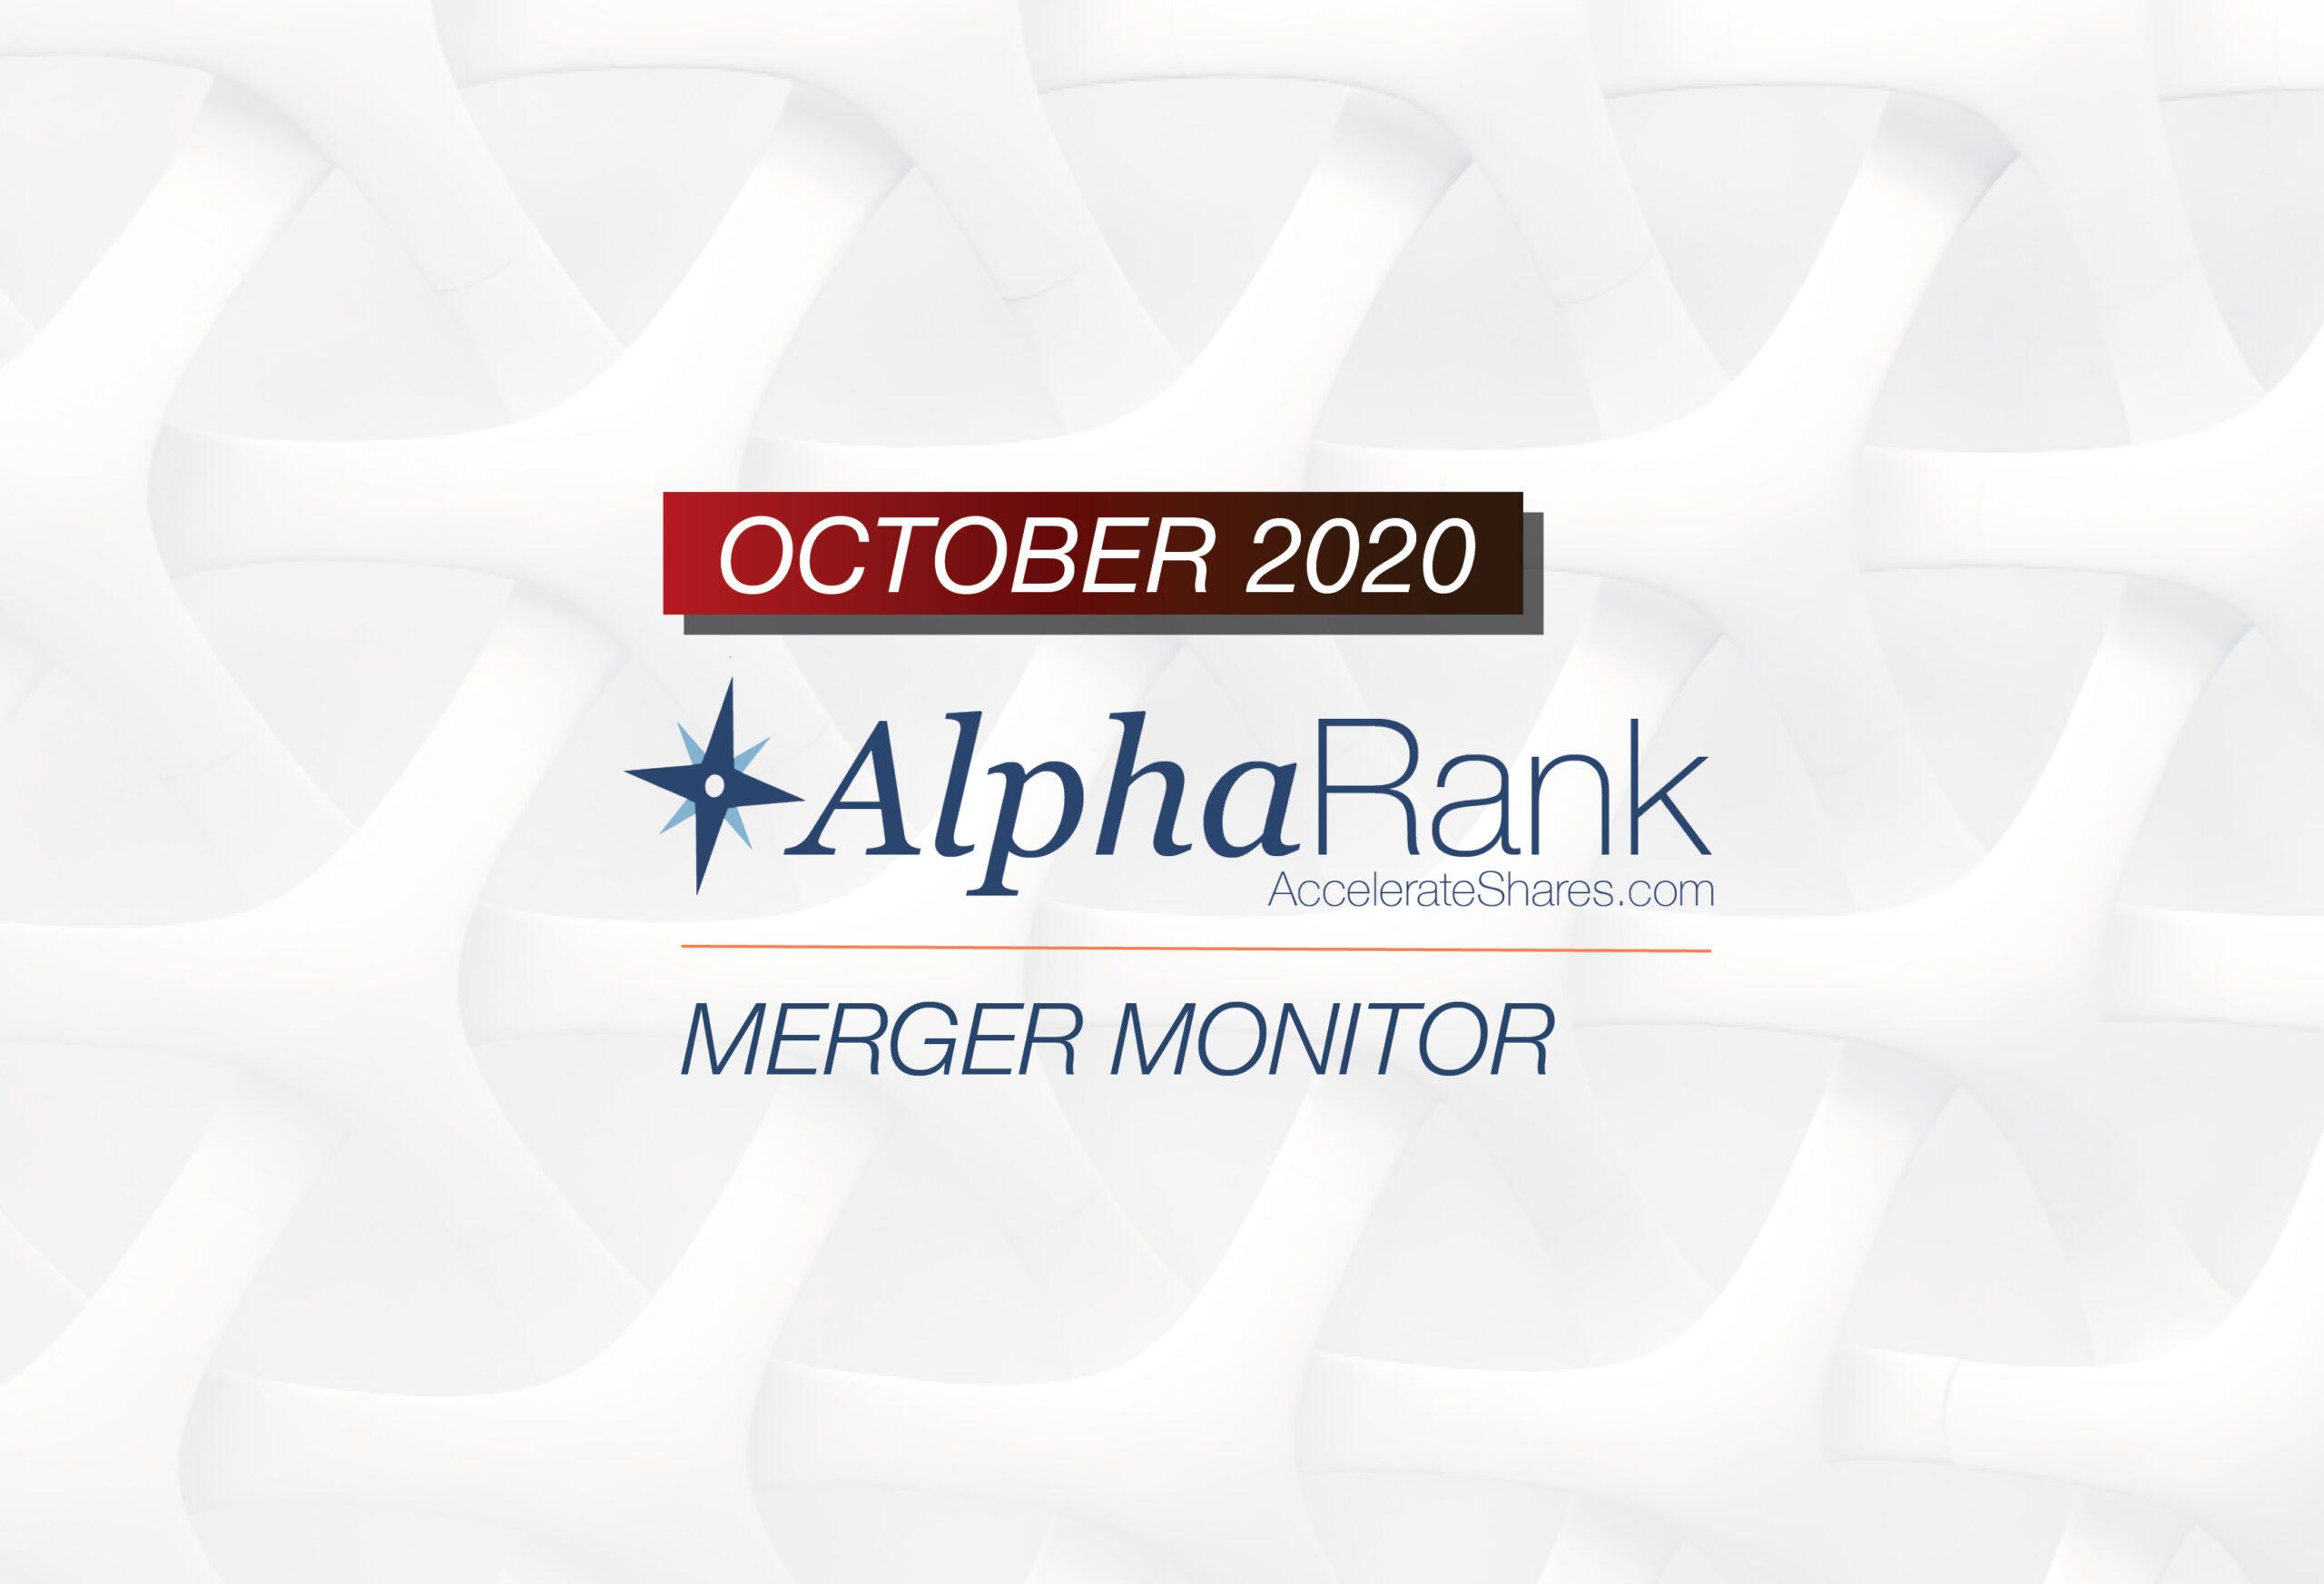 AlphaRank Merger Monitor – October 2020